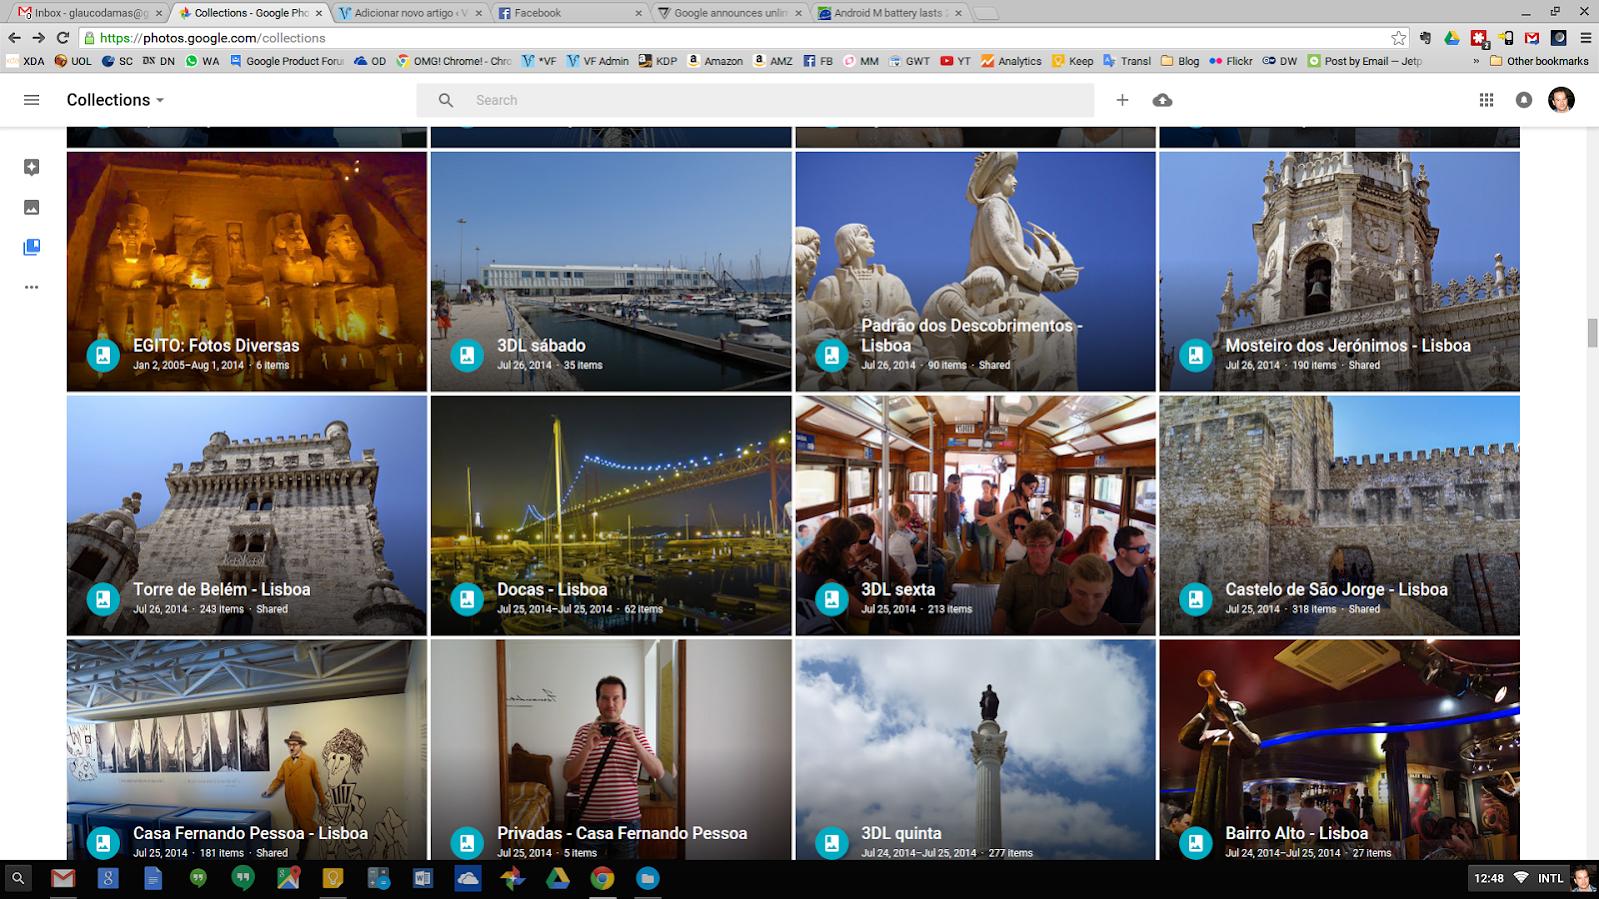 Novo Google Fotos: recursos inteligentes e armazenamento ilimitado